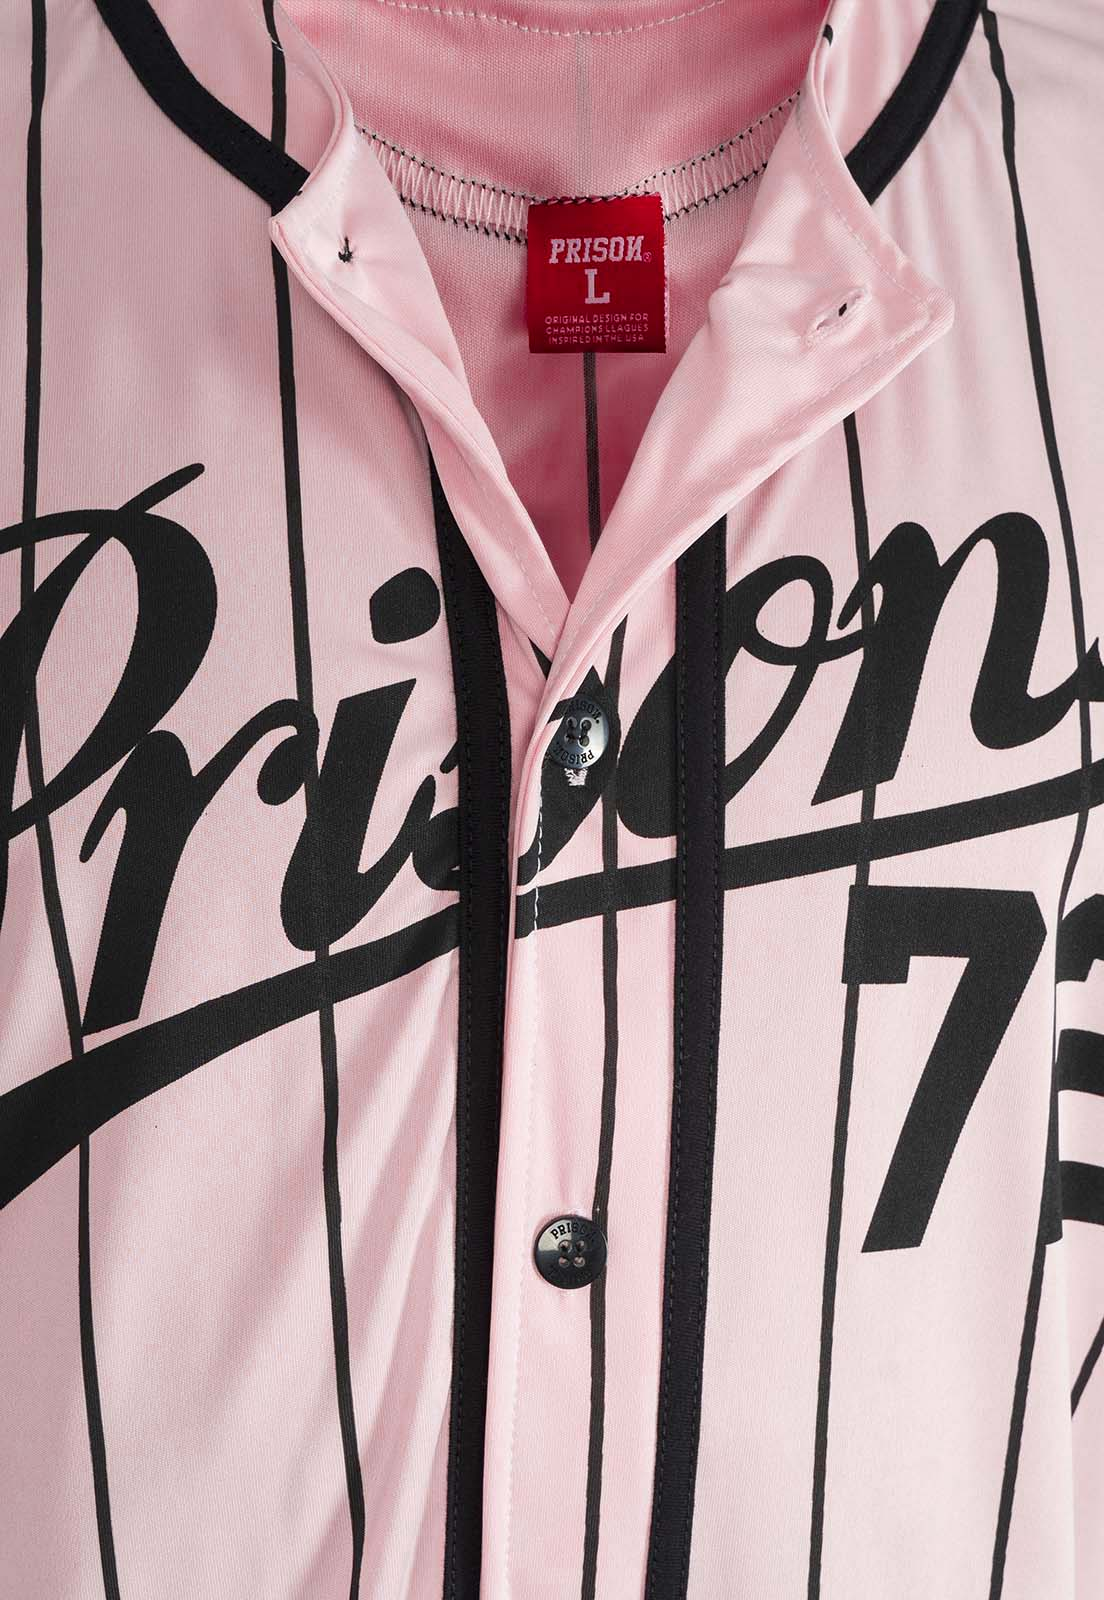 Camisa De Baseball league Prison Listrada Pink